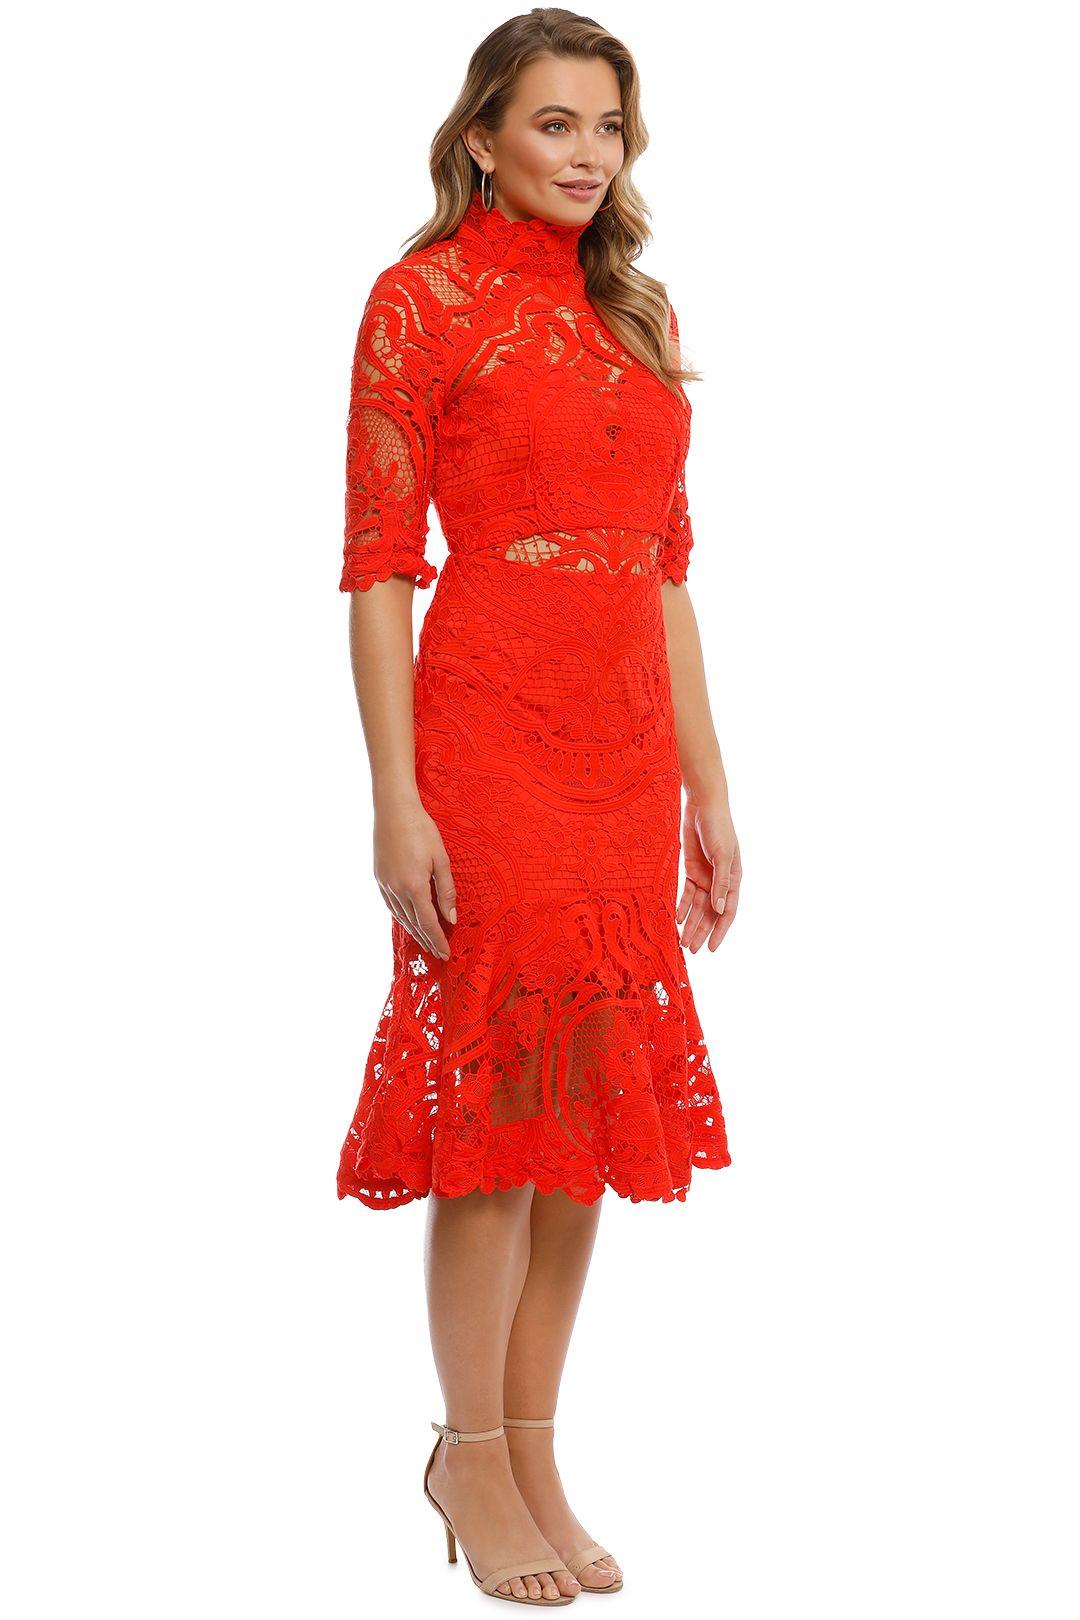 Thurley - Eternity Dress - Madarin - Side